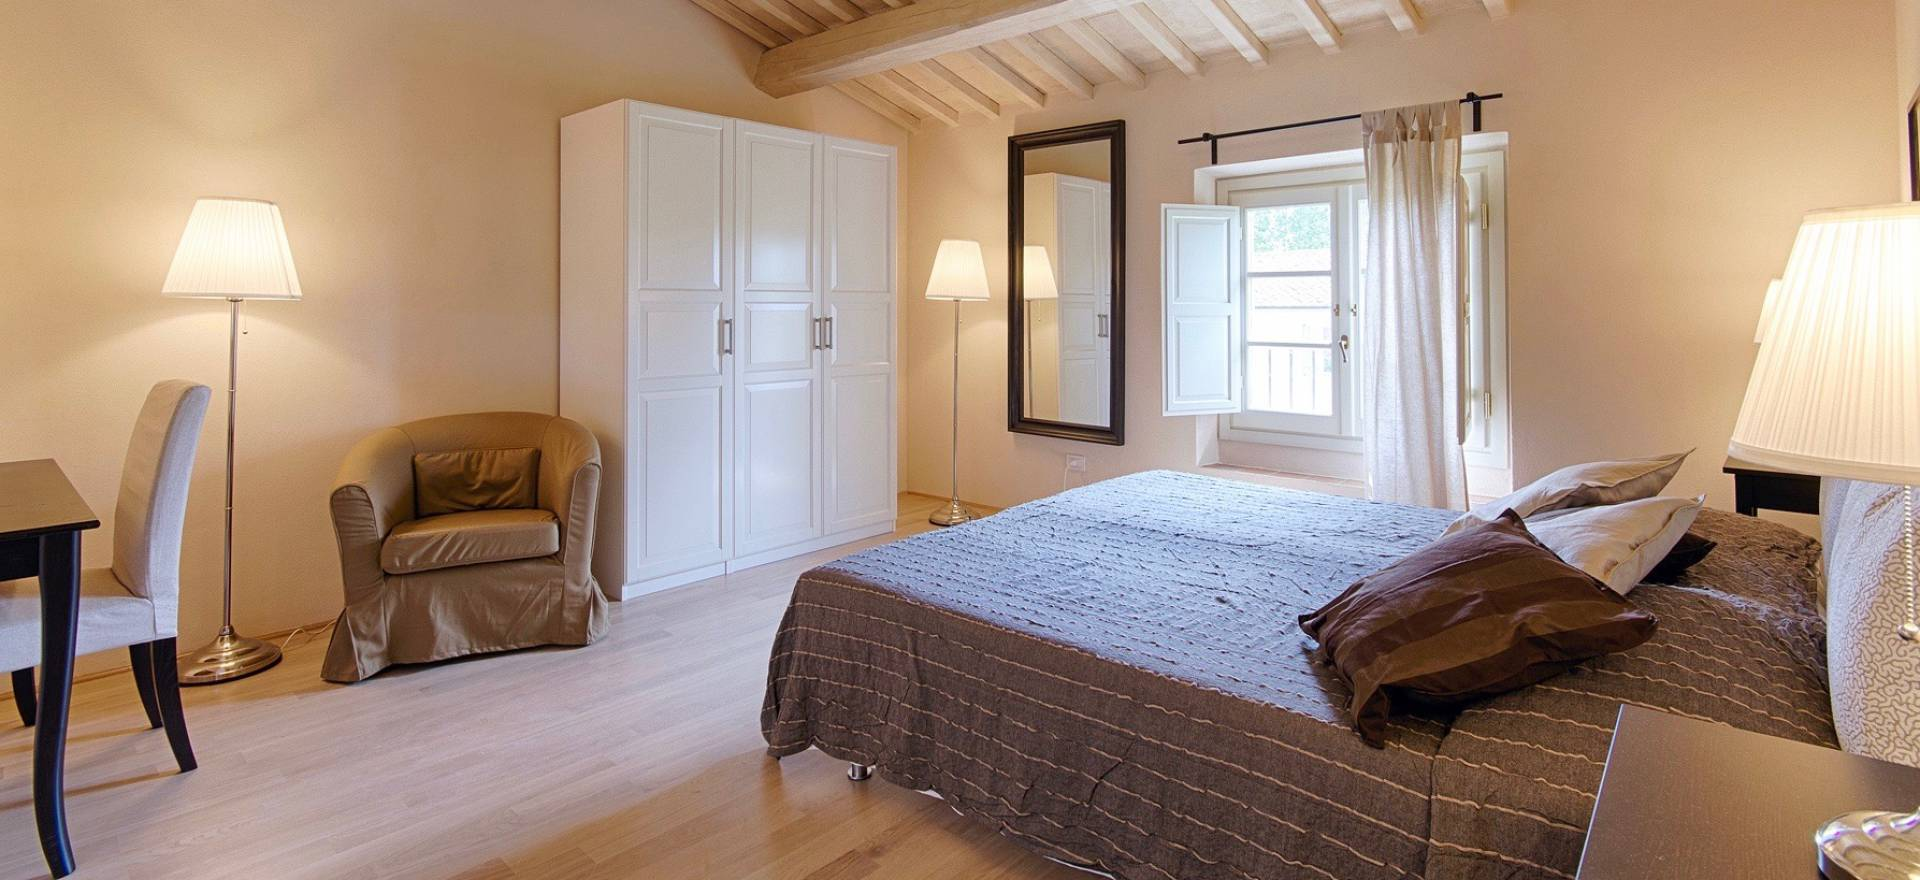 Kindvriendelijke residence nabij het strand in Toscane